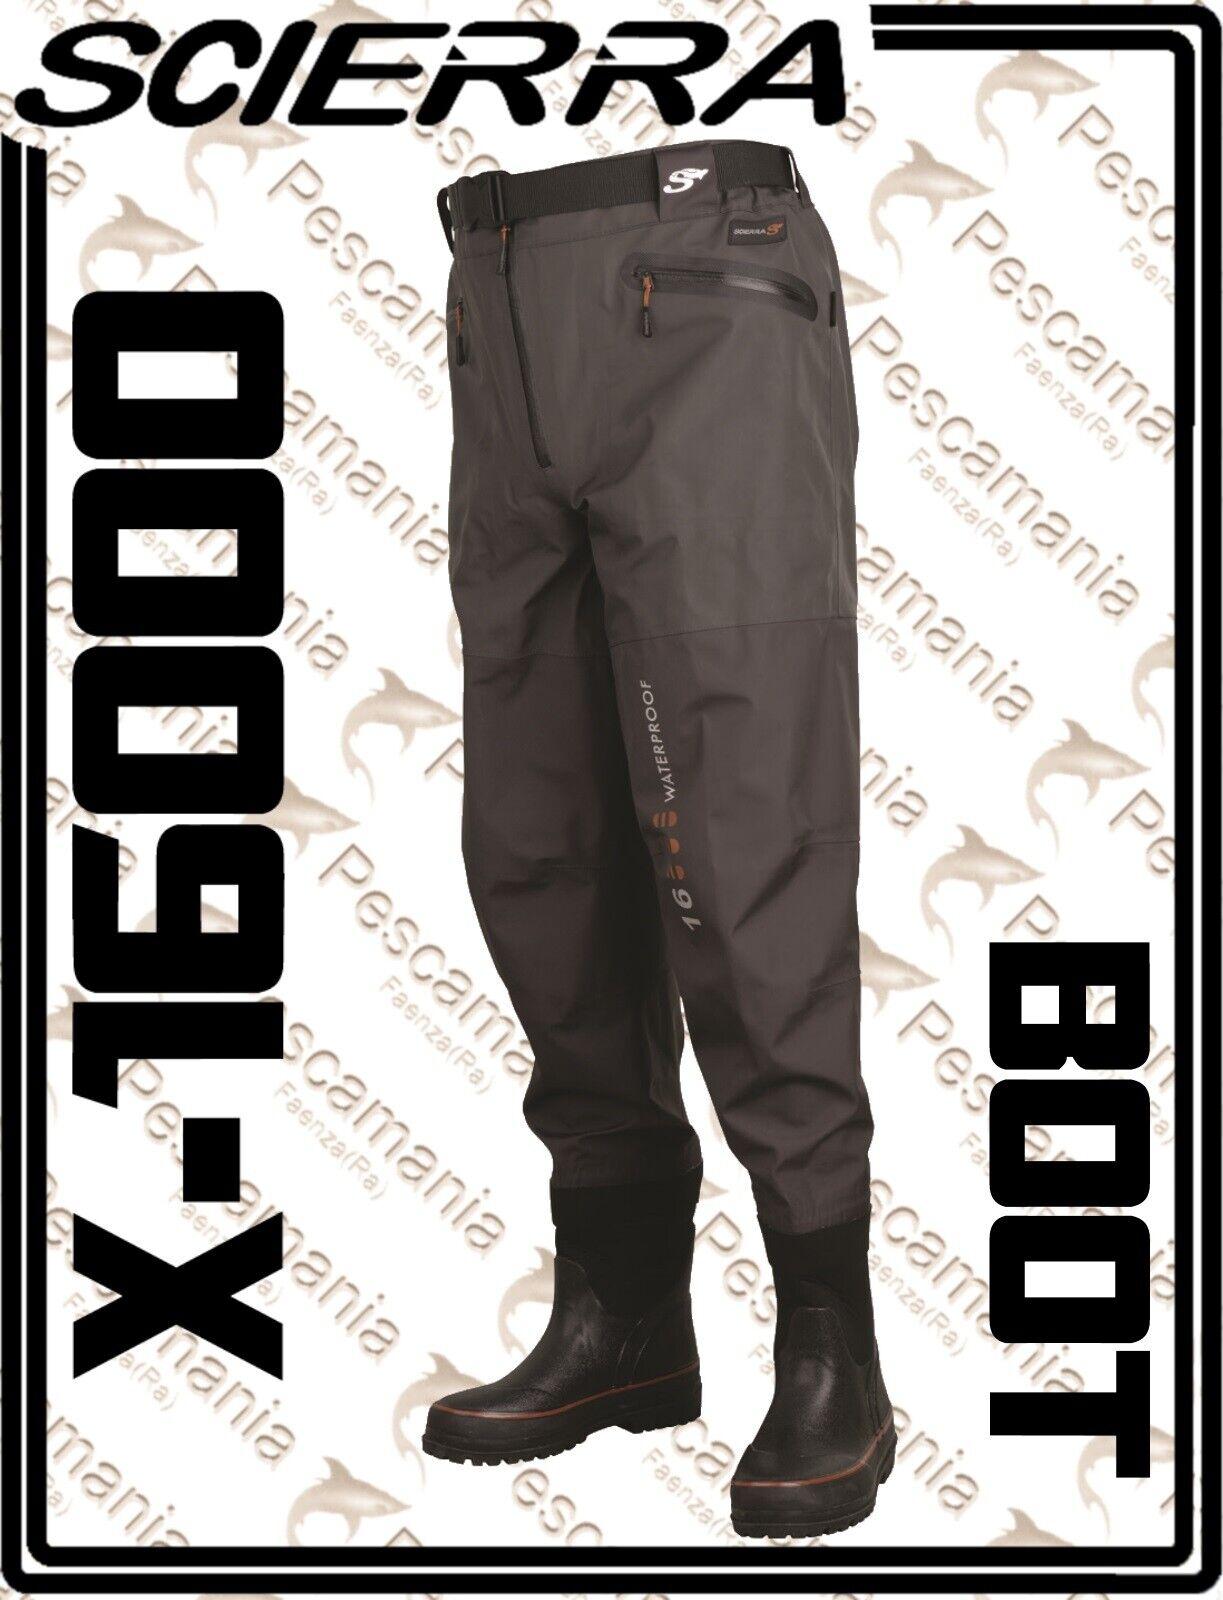 Wader Scierra X16000 3 capa Pantalones transpirables con bota